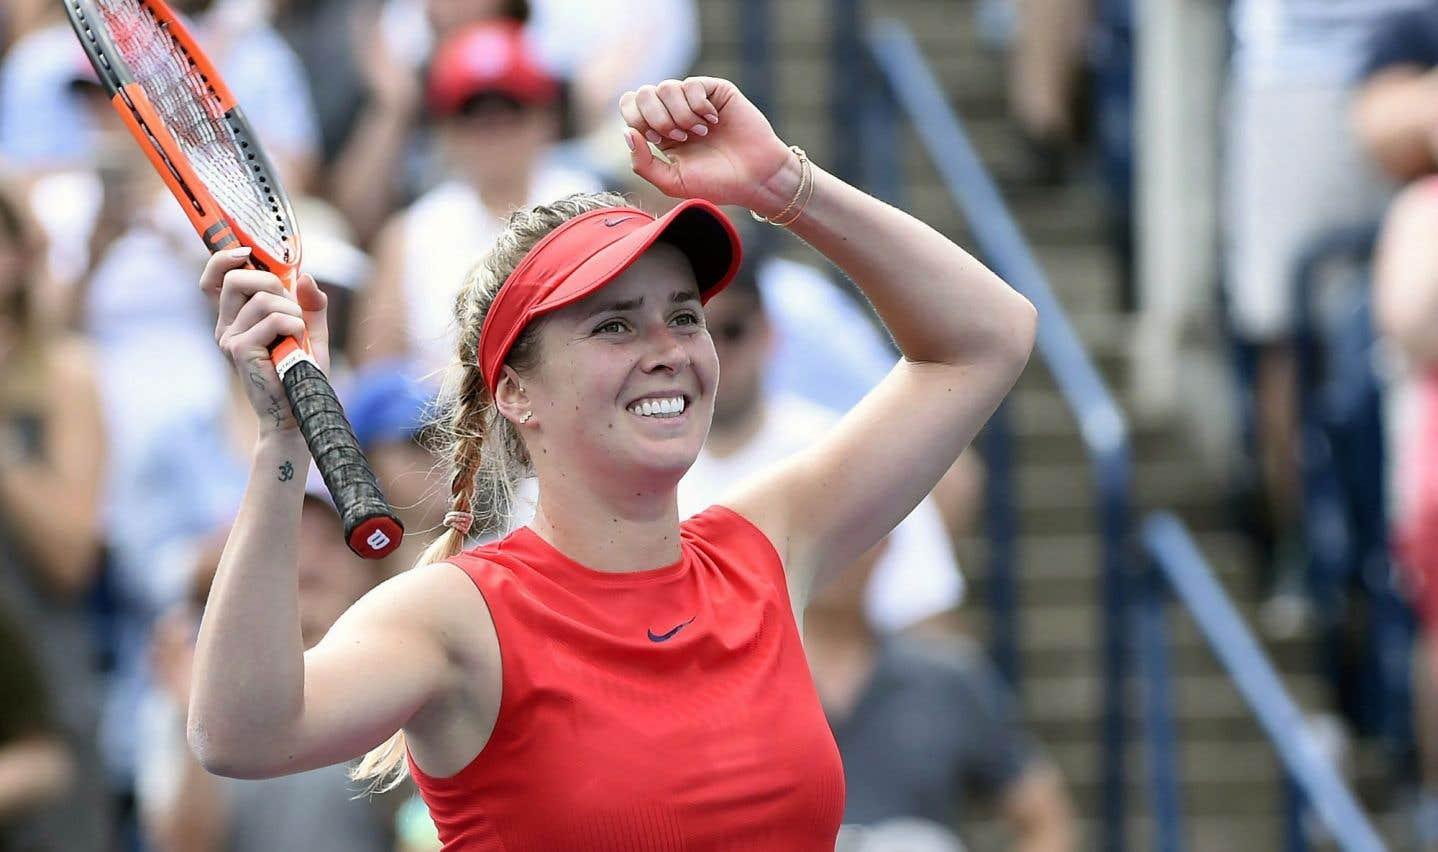 Svitolina triomphe à la Coupe Rogers, battant Wozniacki en finale